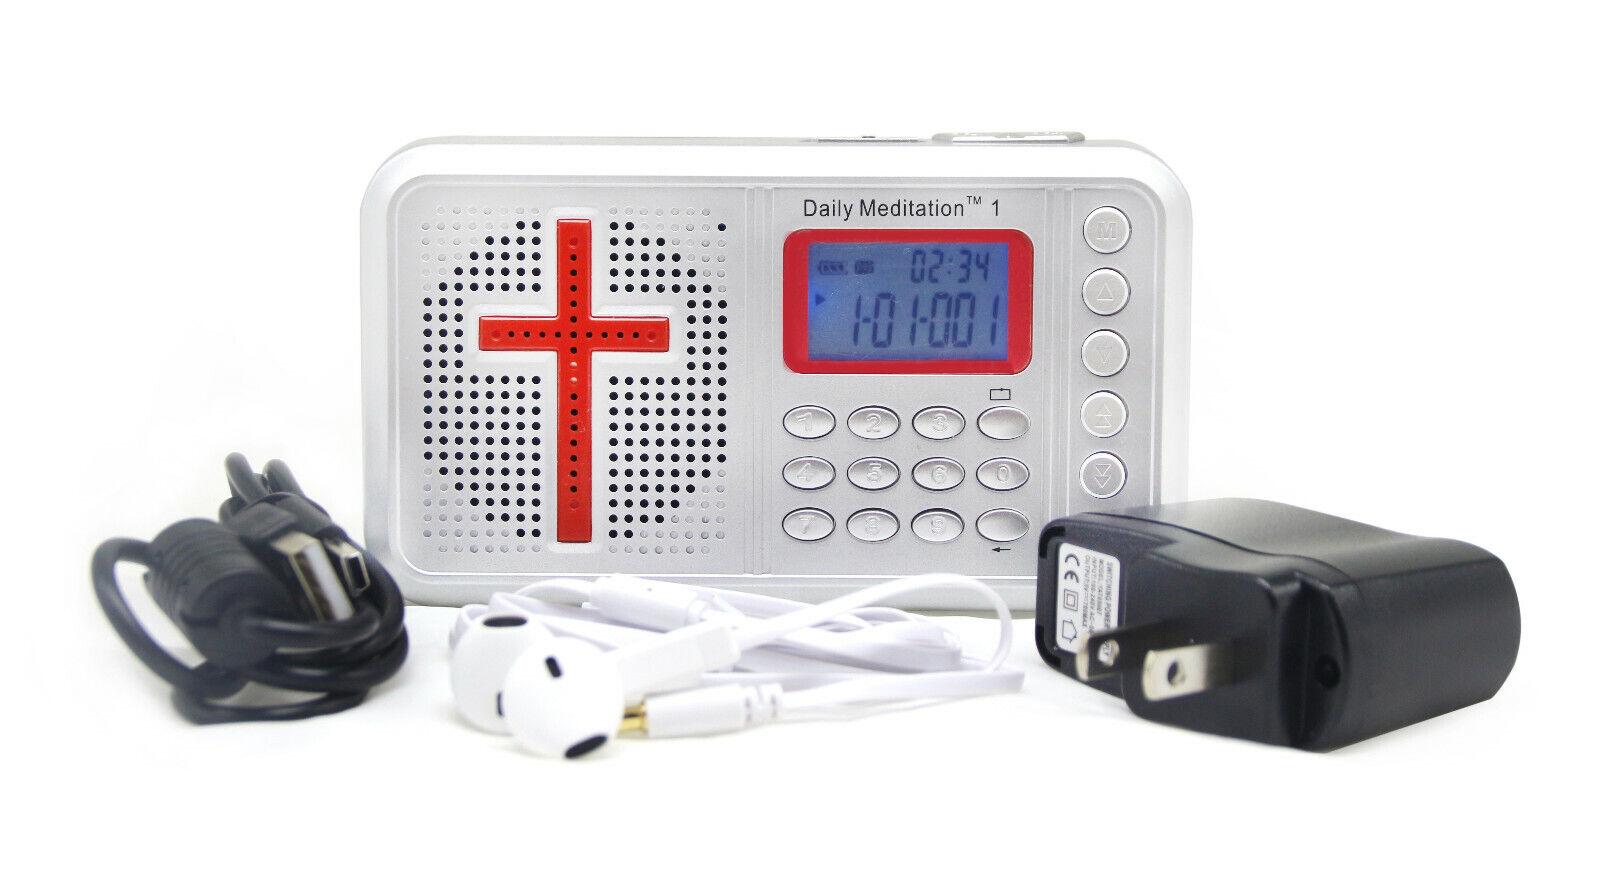 Daily Meditation 1 ESV Dramatized Audio Bible Player - ESV E